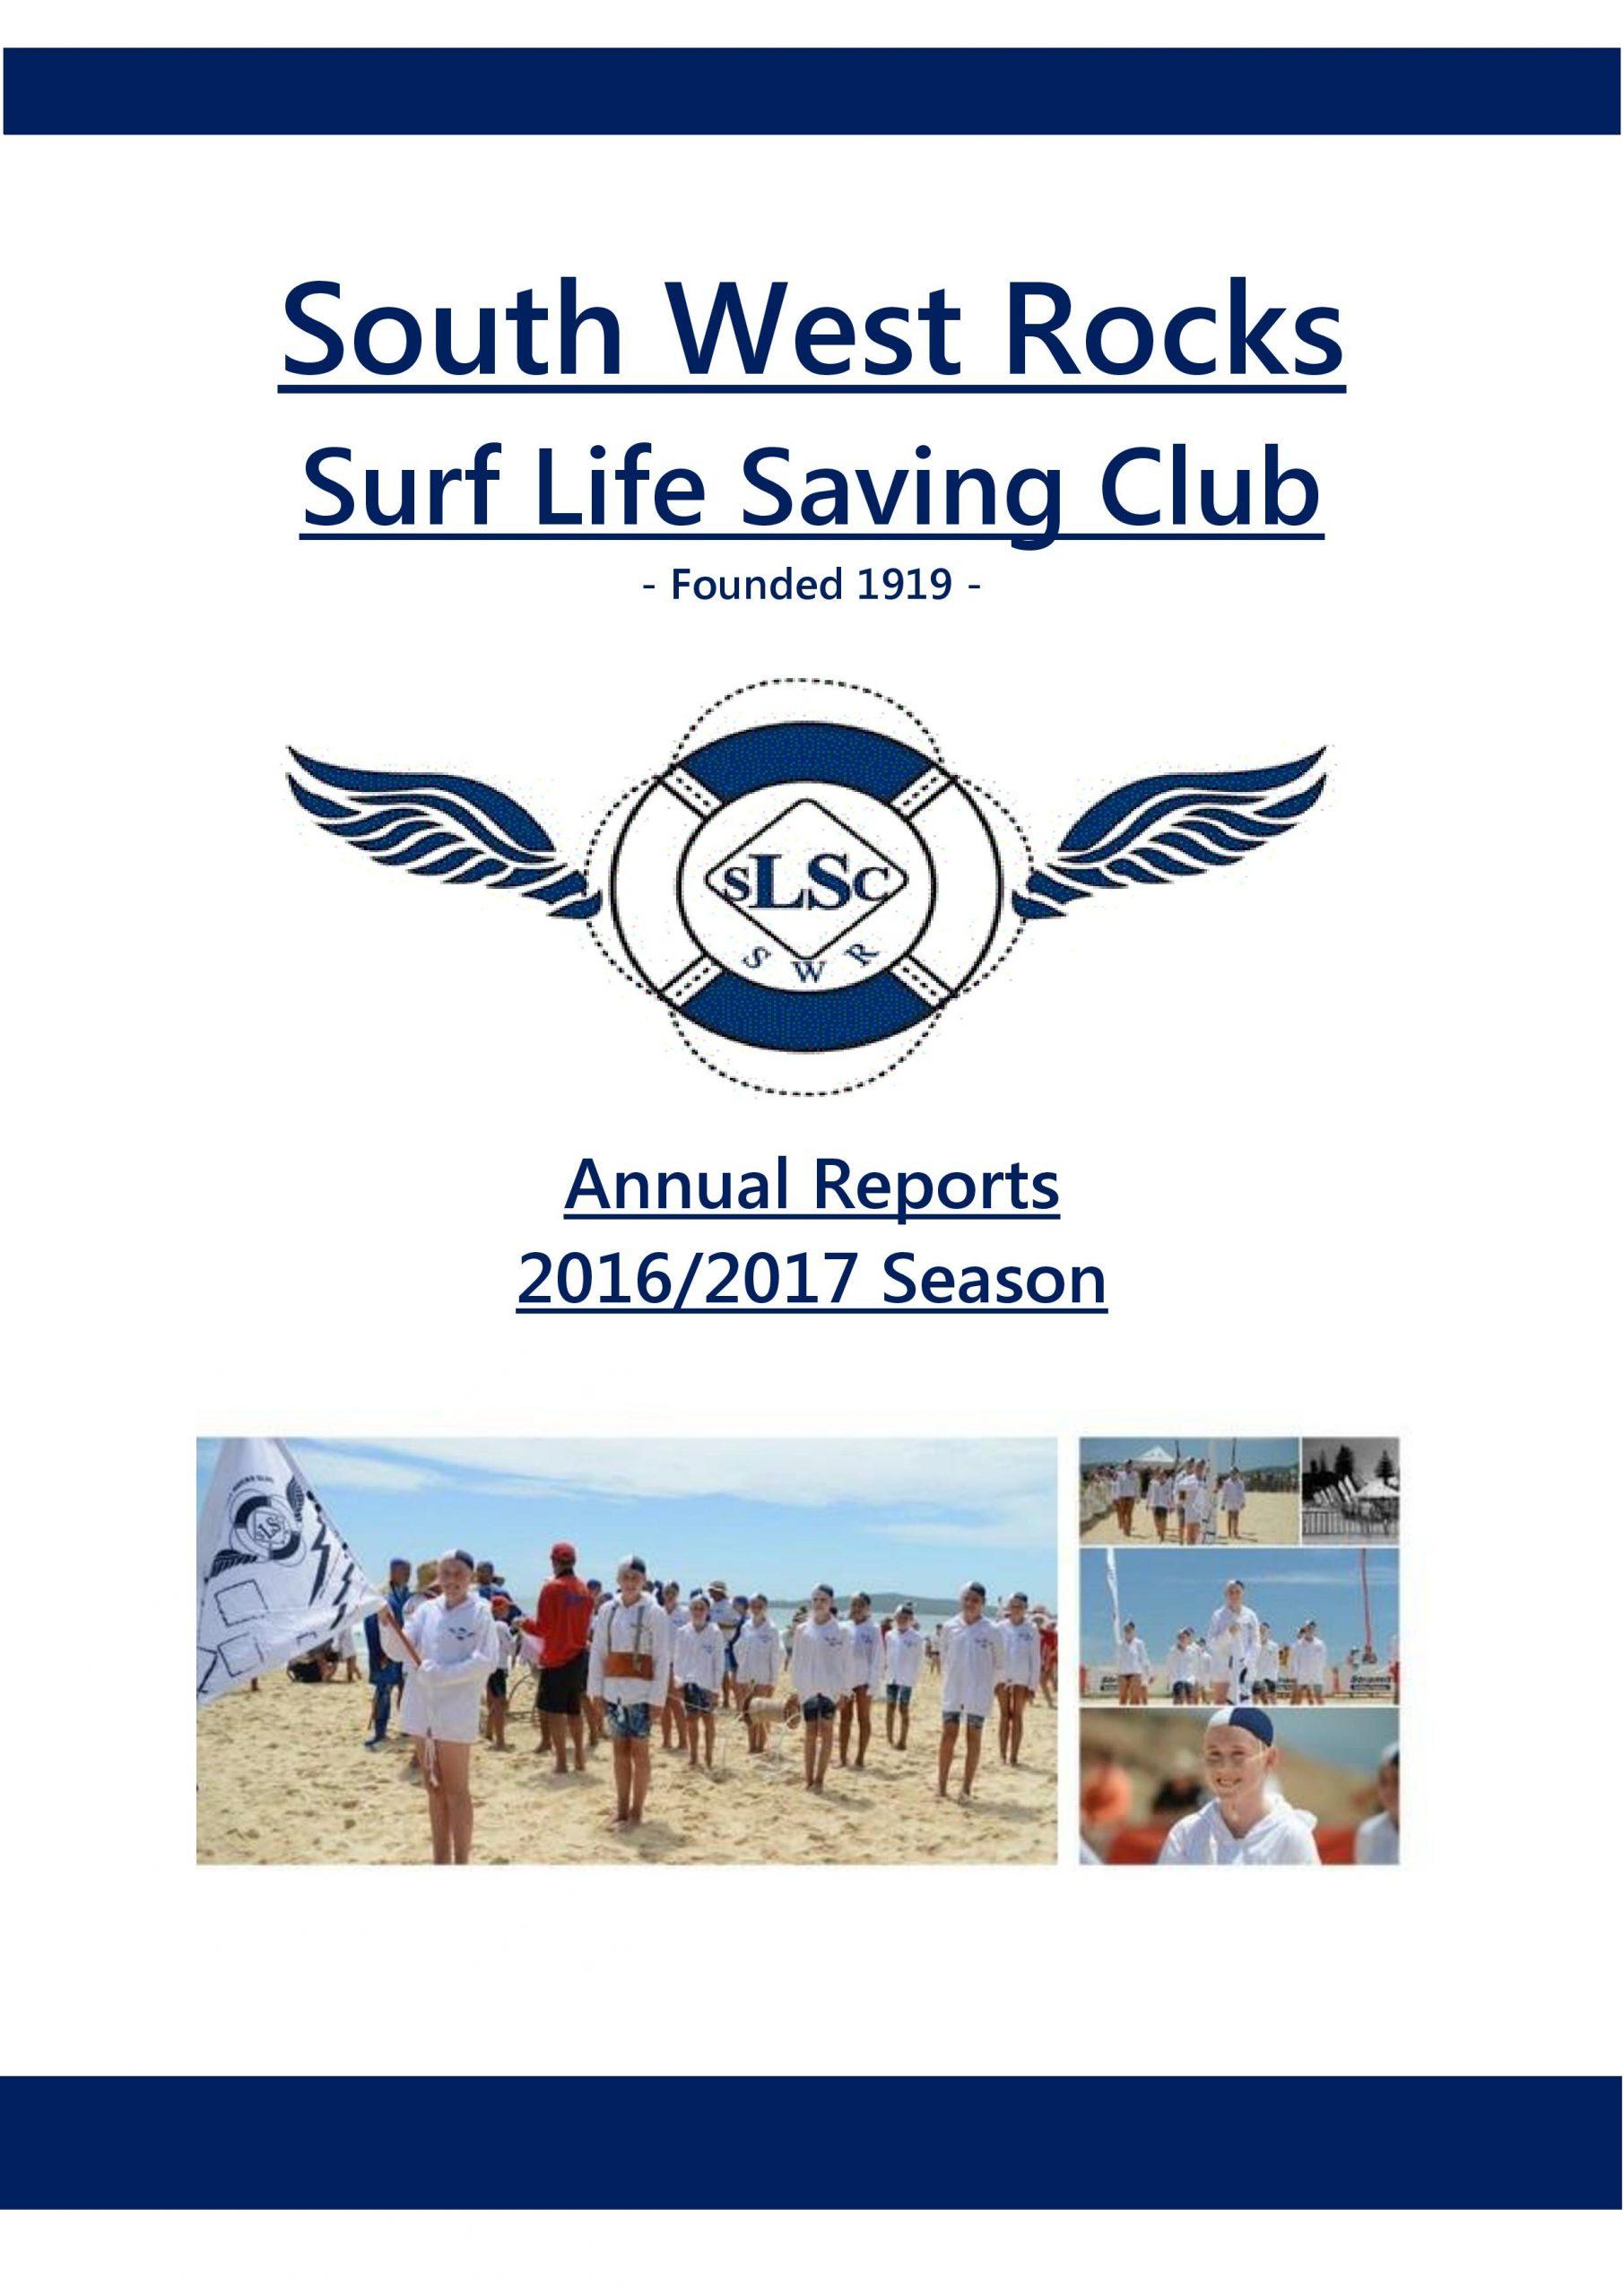 SWRSLSC - Annual Report 2016-17